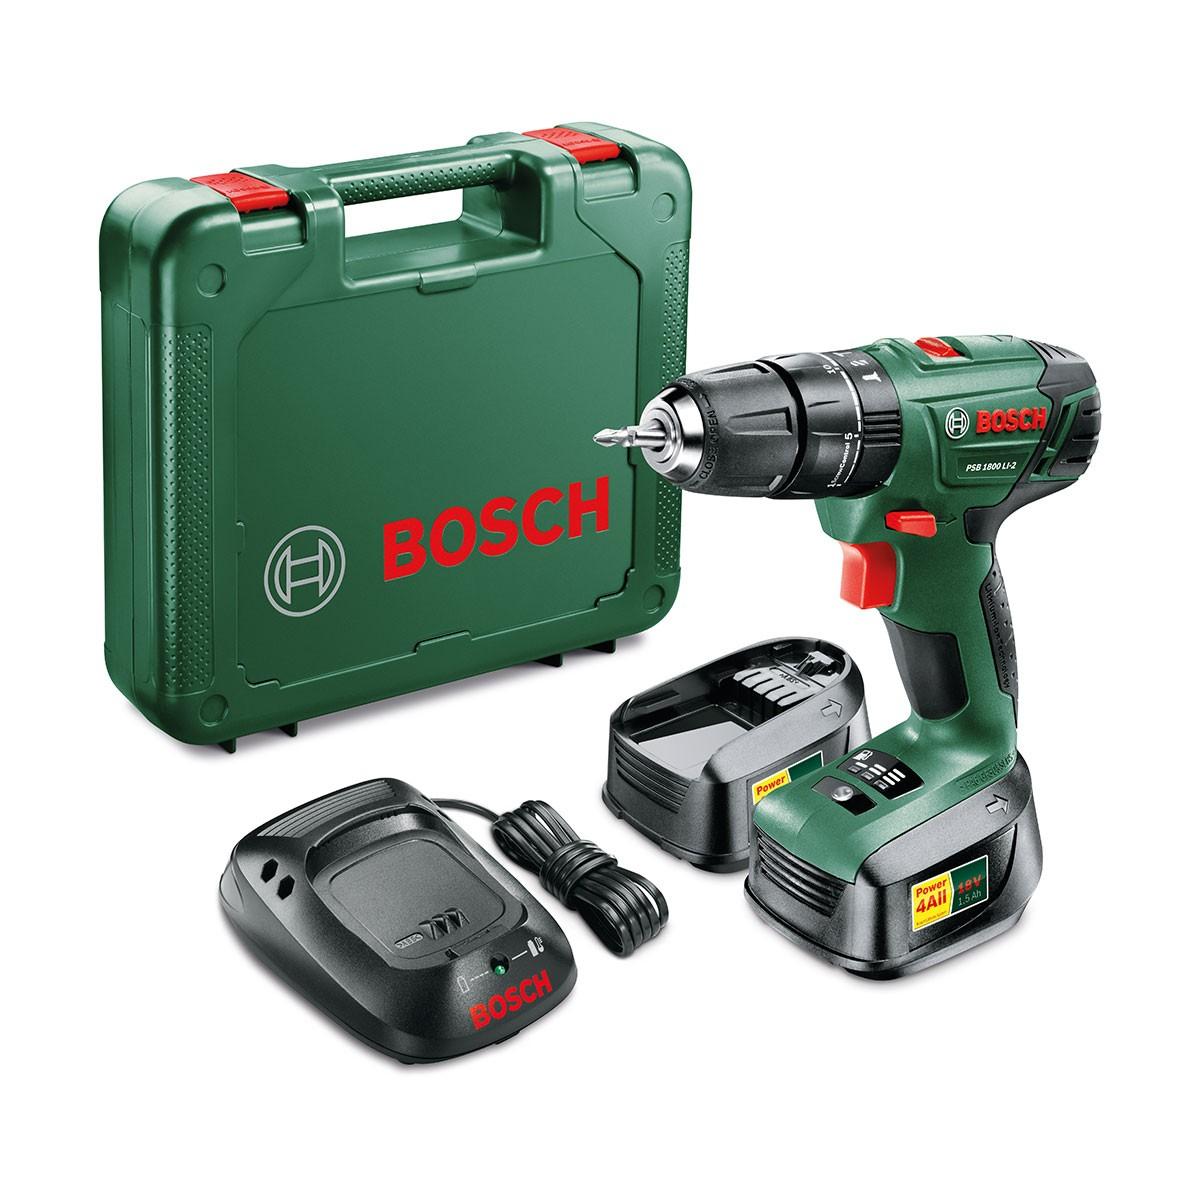 Bosch PSB Li-2 1800 18V Cordless Drill with Spare Battery & Case £67.99 @ Robert Dyas